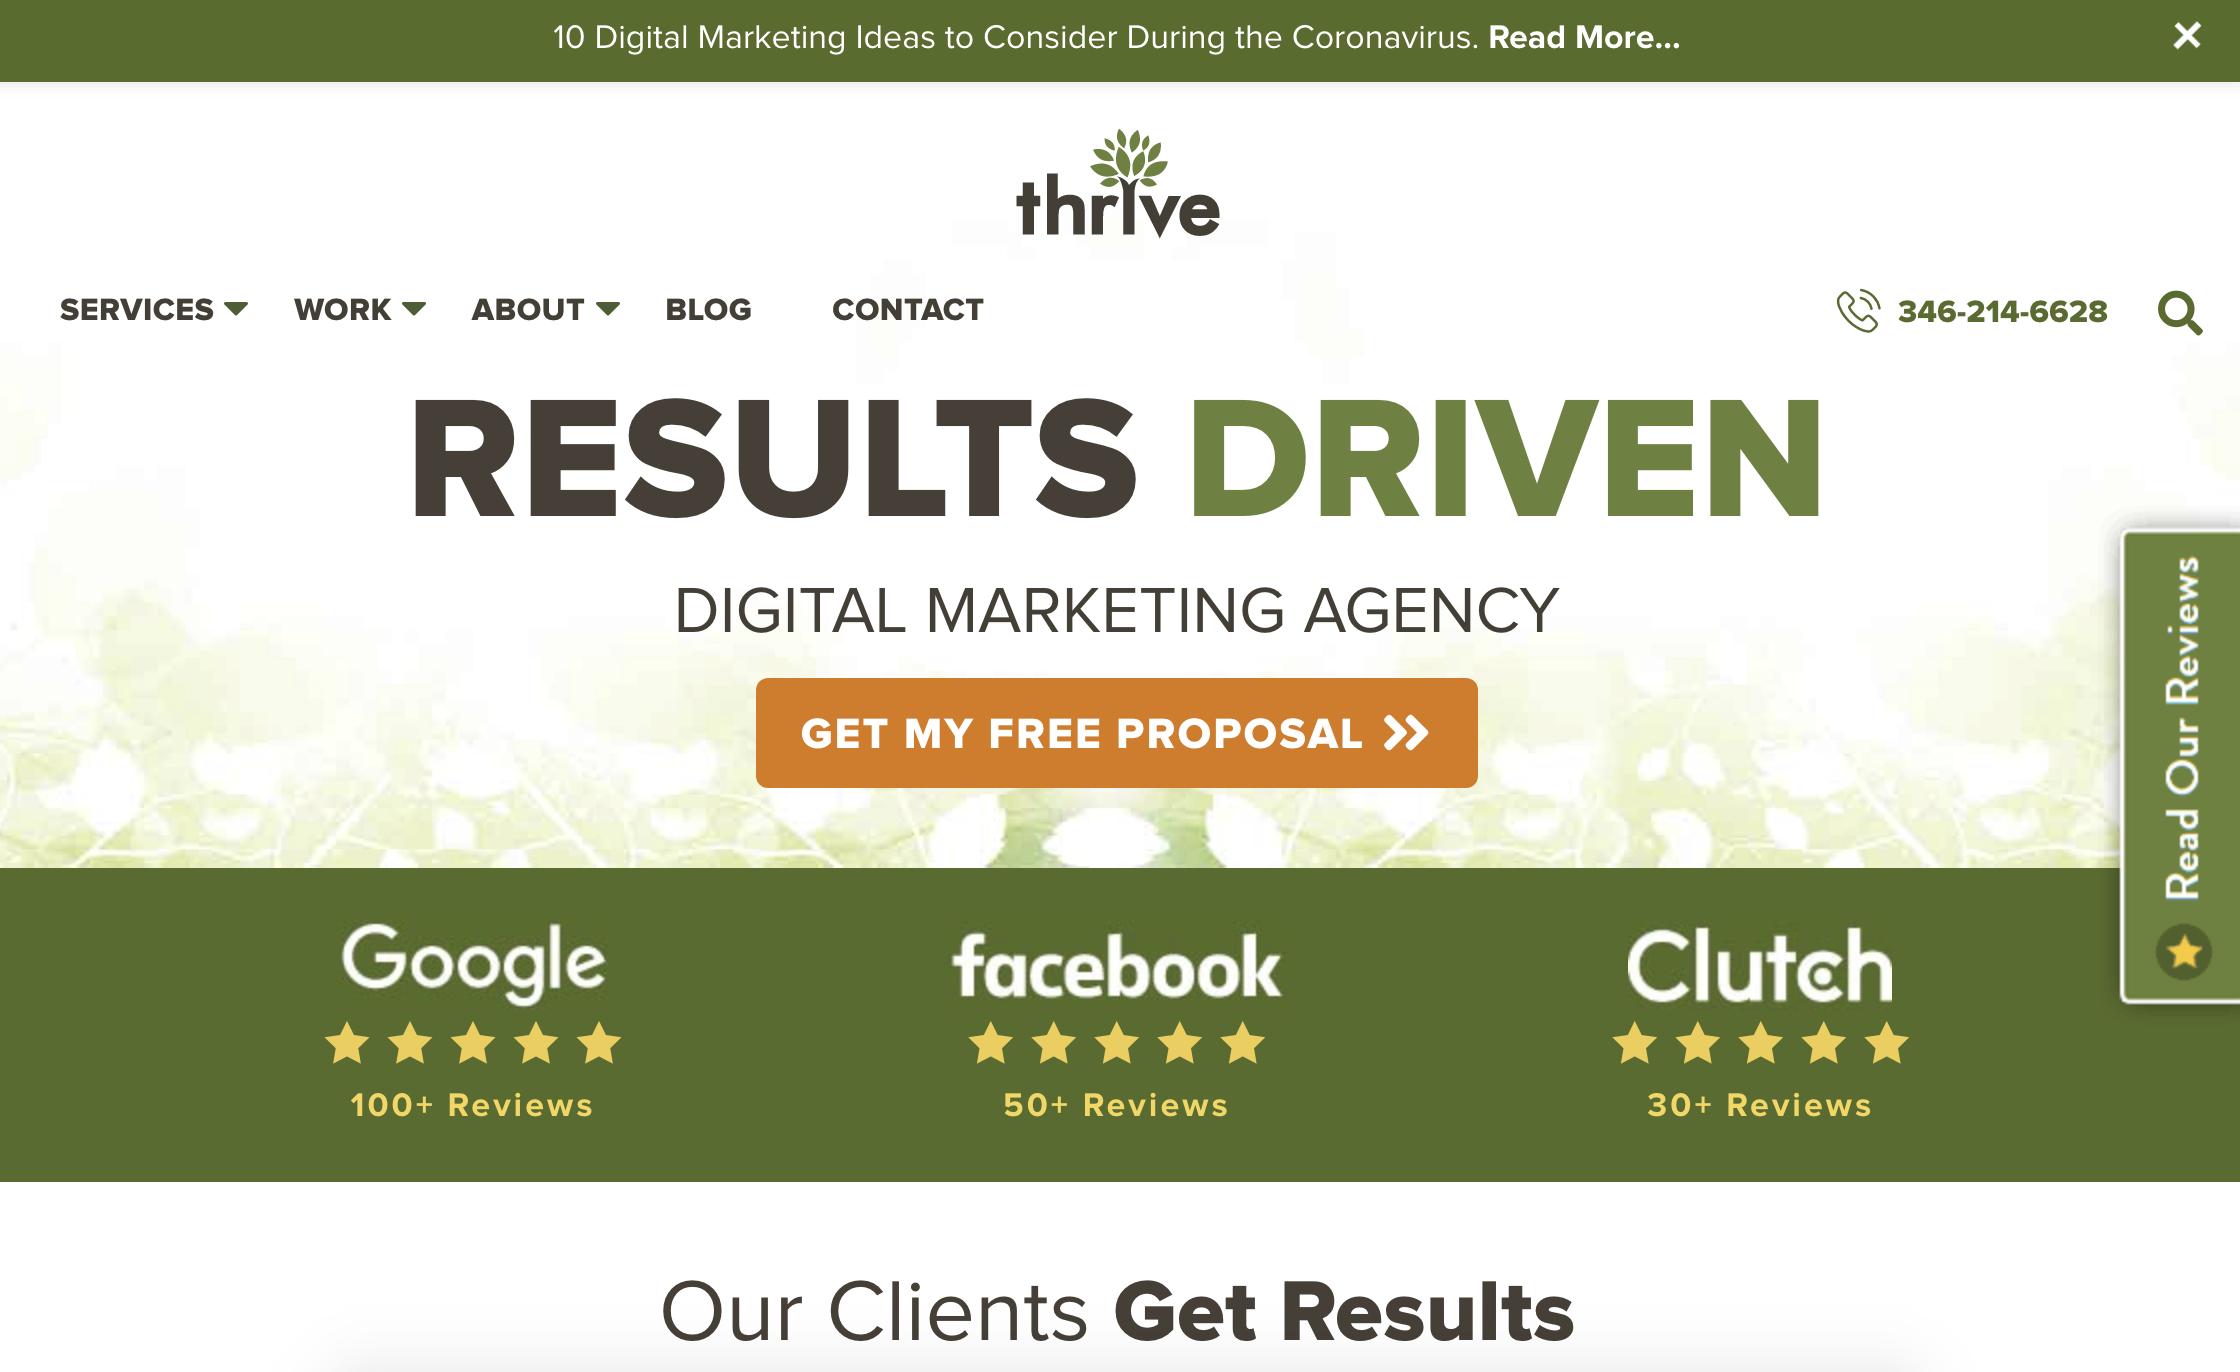 thrive digital marketing agency